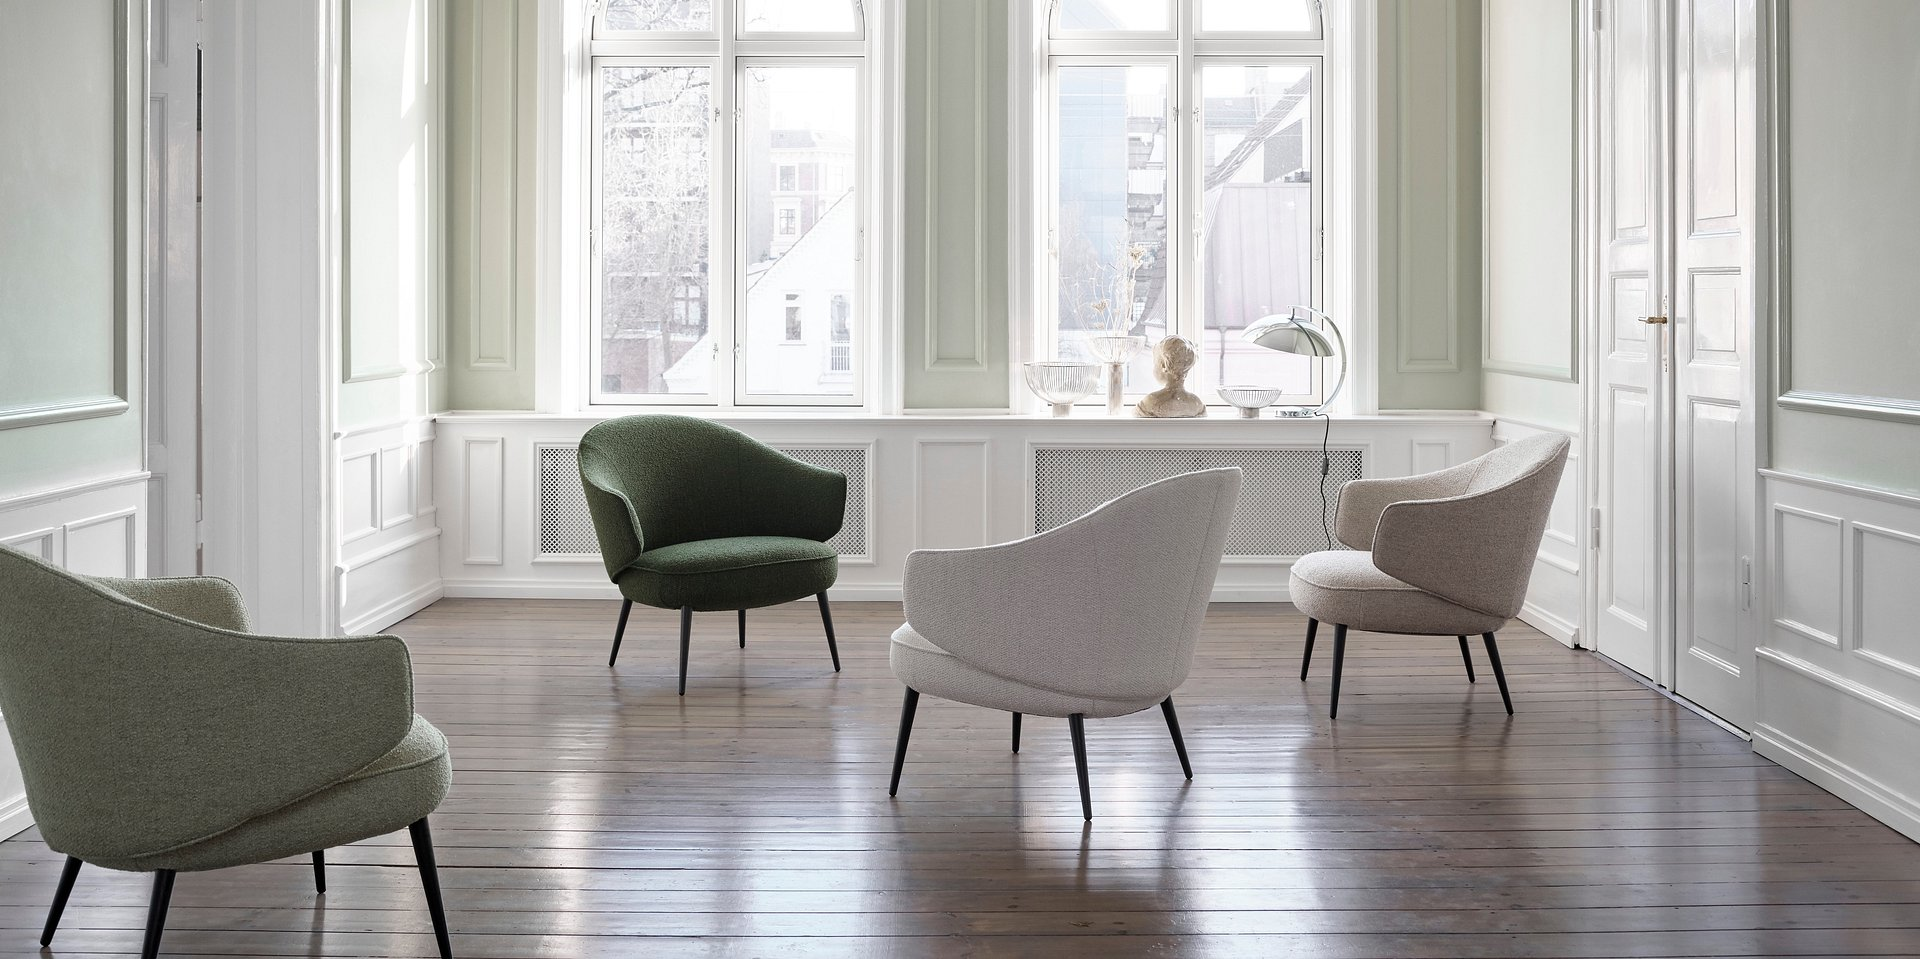 BoConcept przedstawia nowe meble do salonu projektu Henrika Pedersena